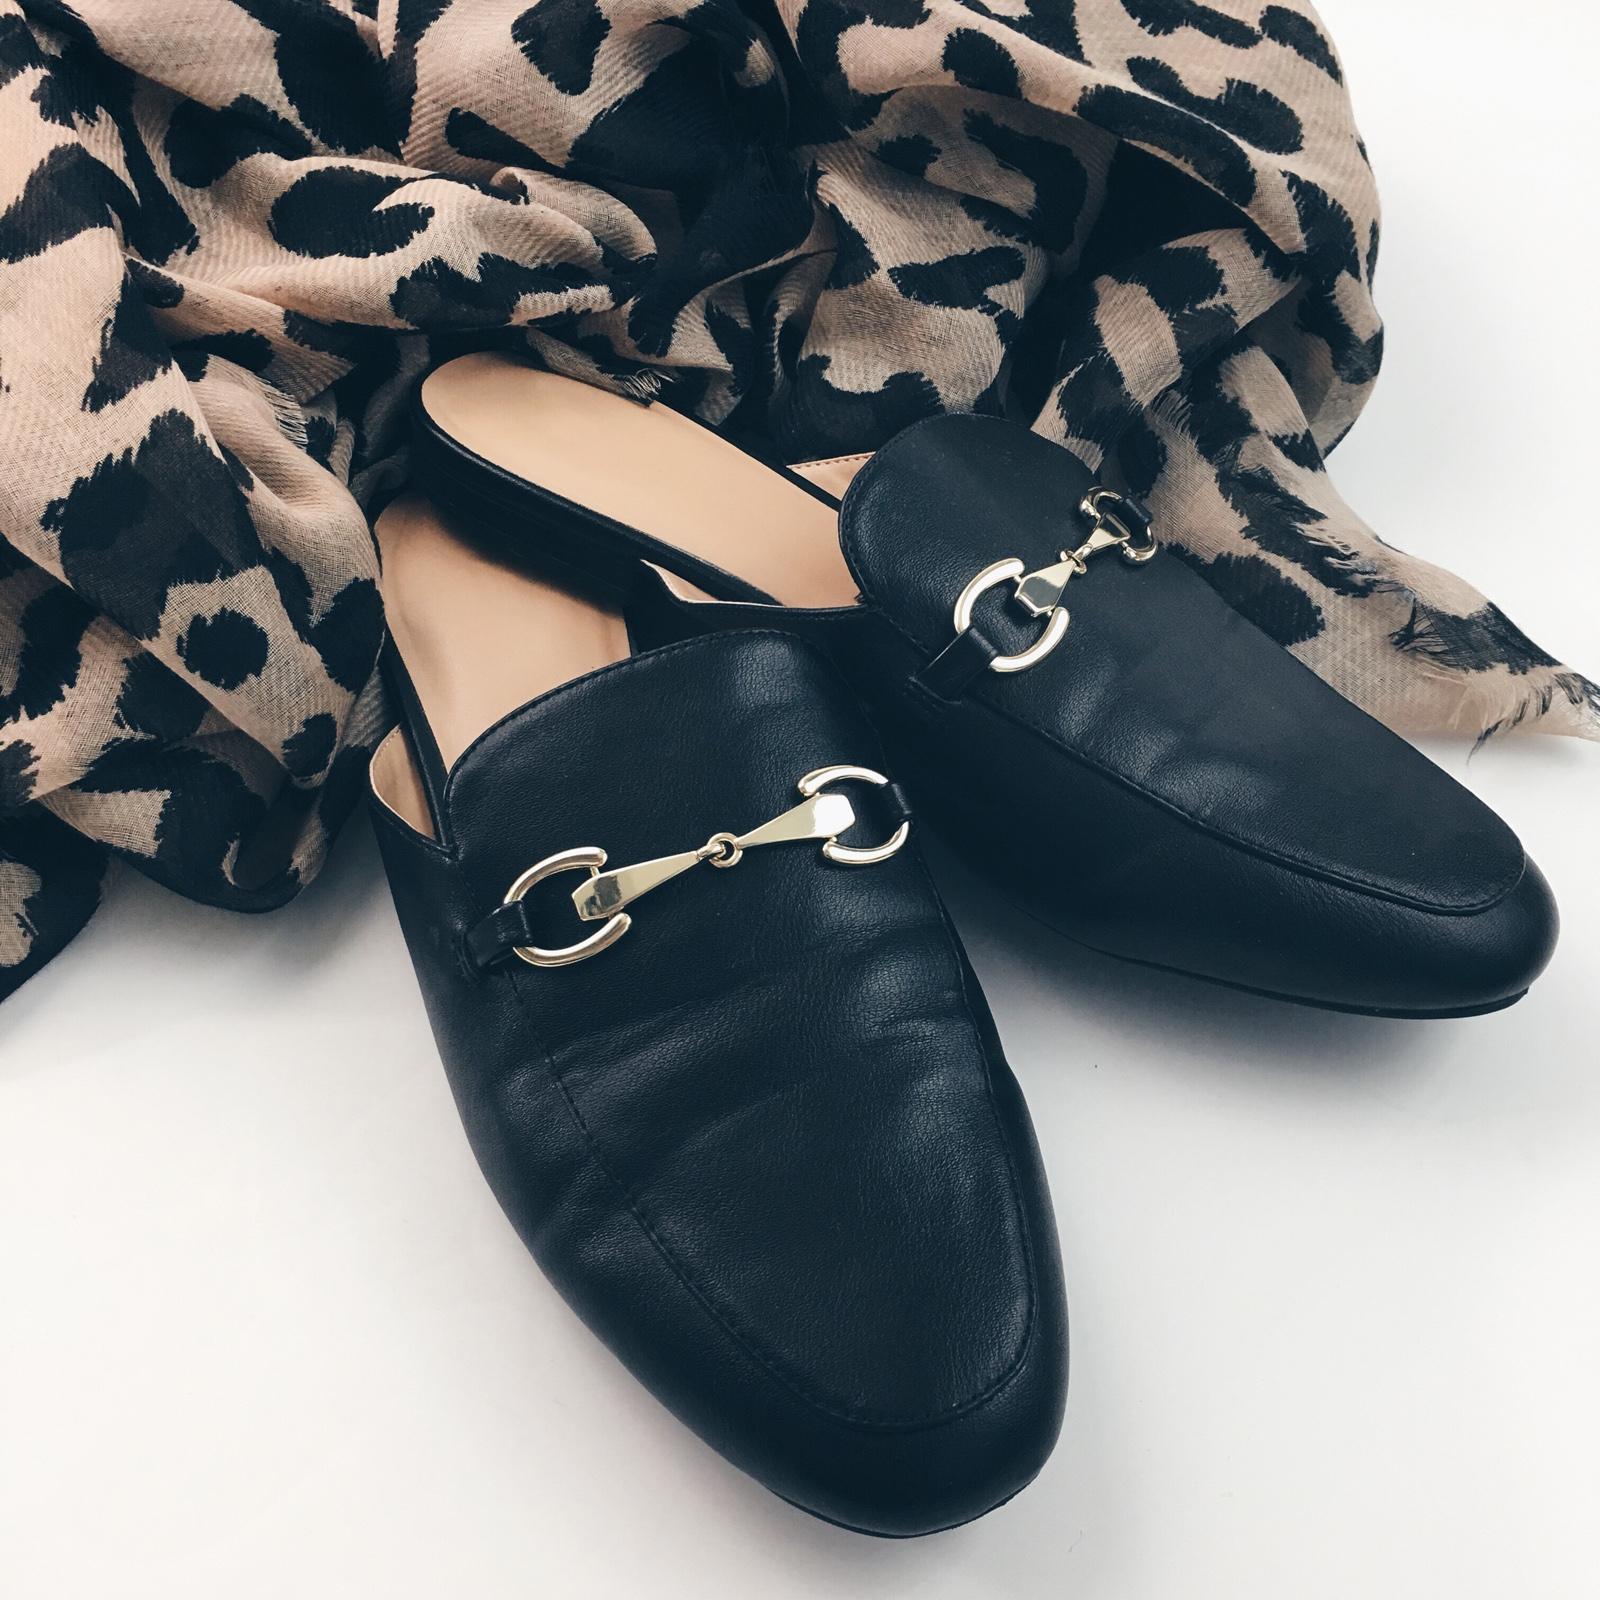 Leopard scarf | black loafer mules | www.shoppingmycloset.com